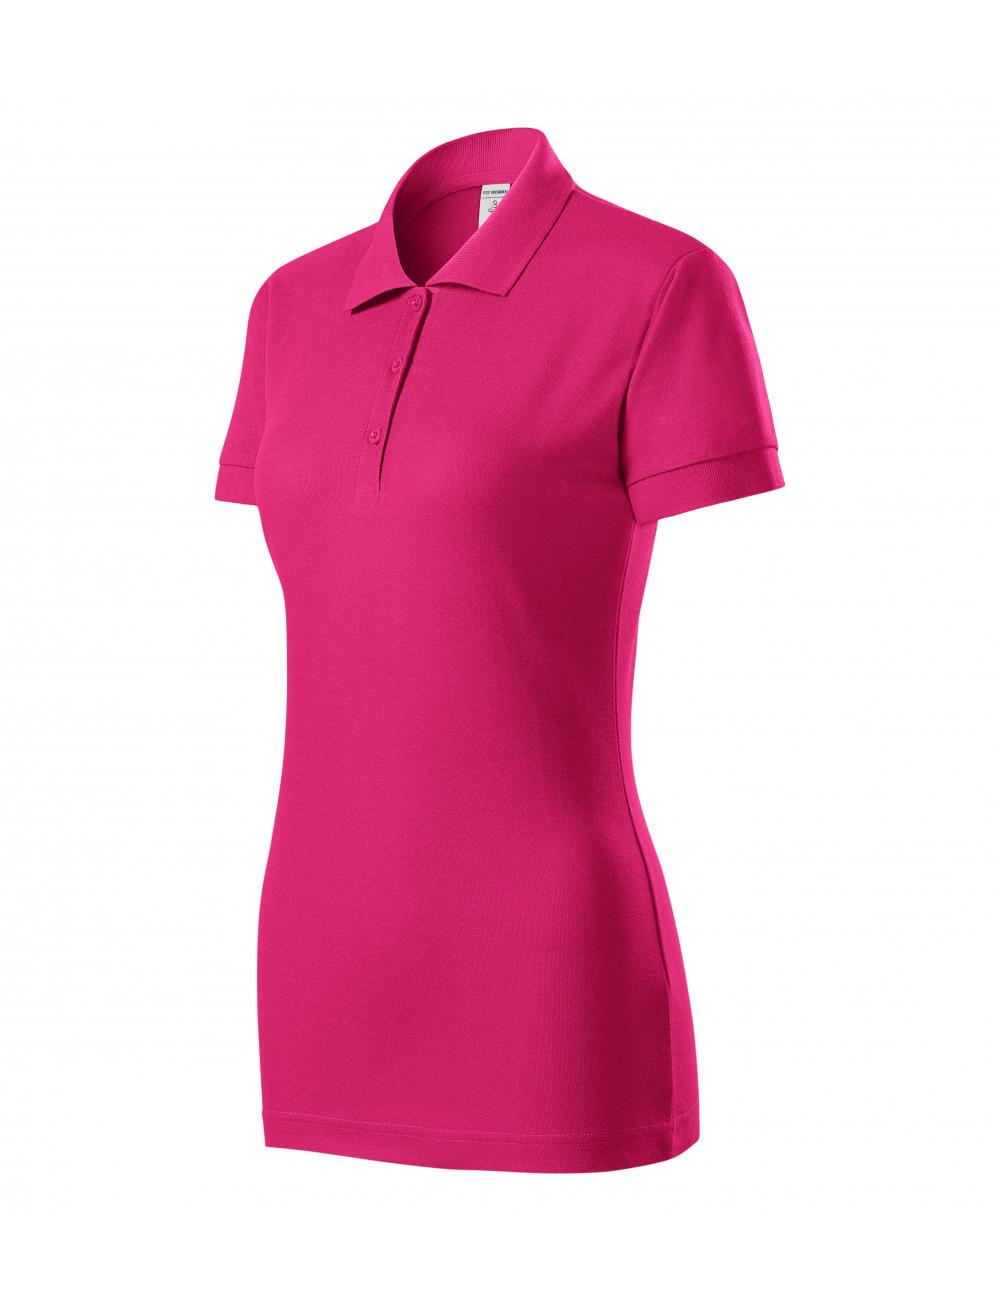 Adler PICCOLIO Koszulka polo damska Joy P22 czerwień purpurowa